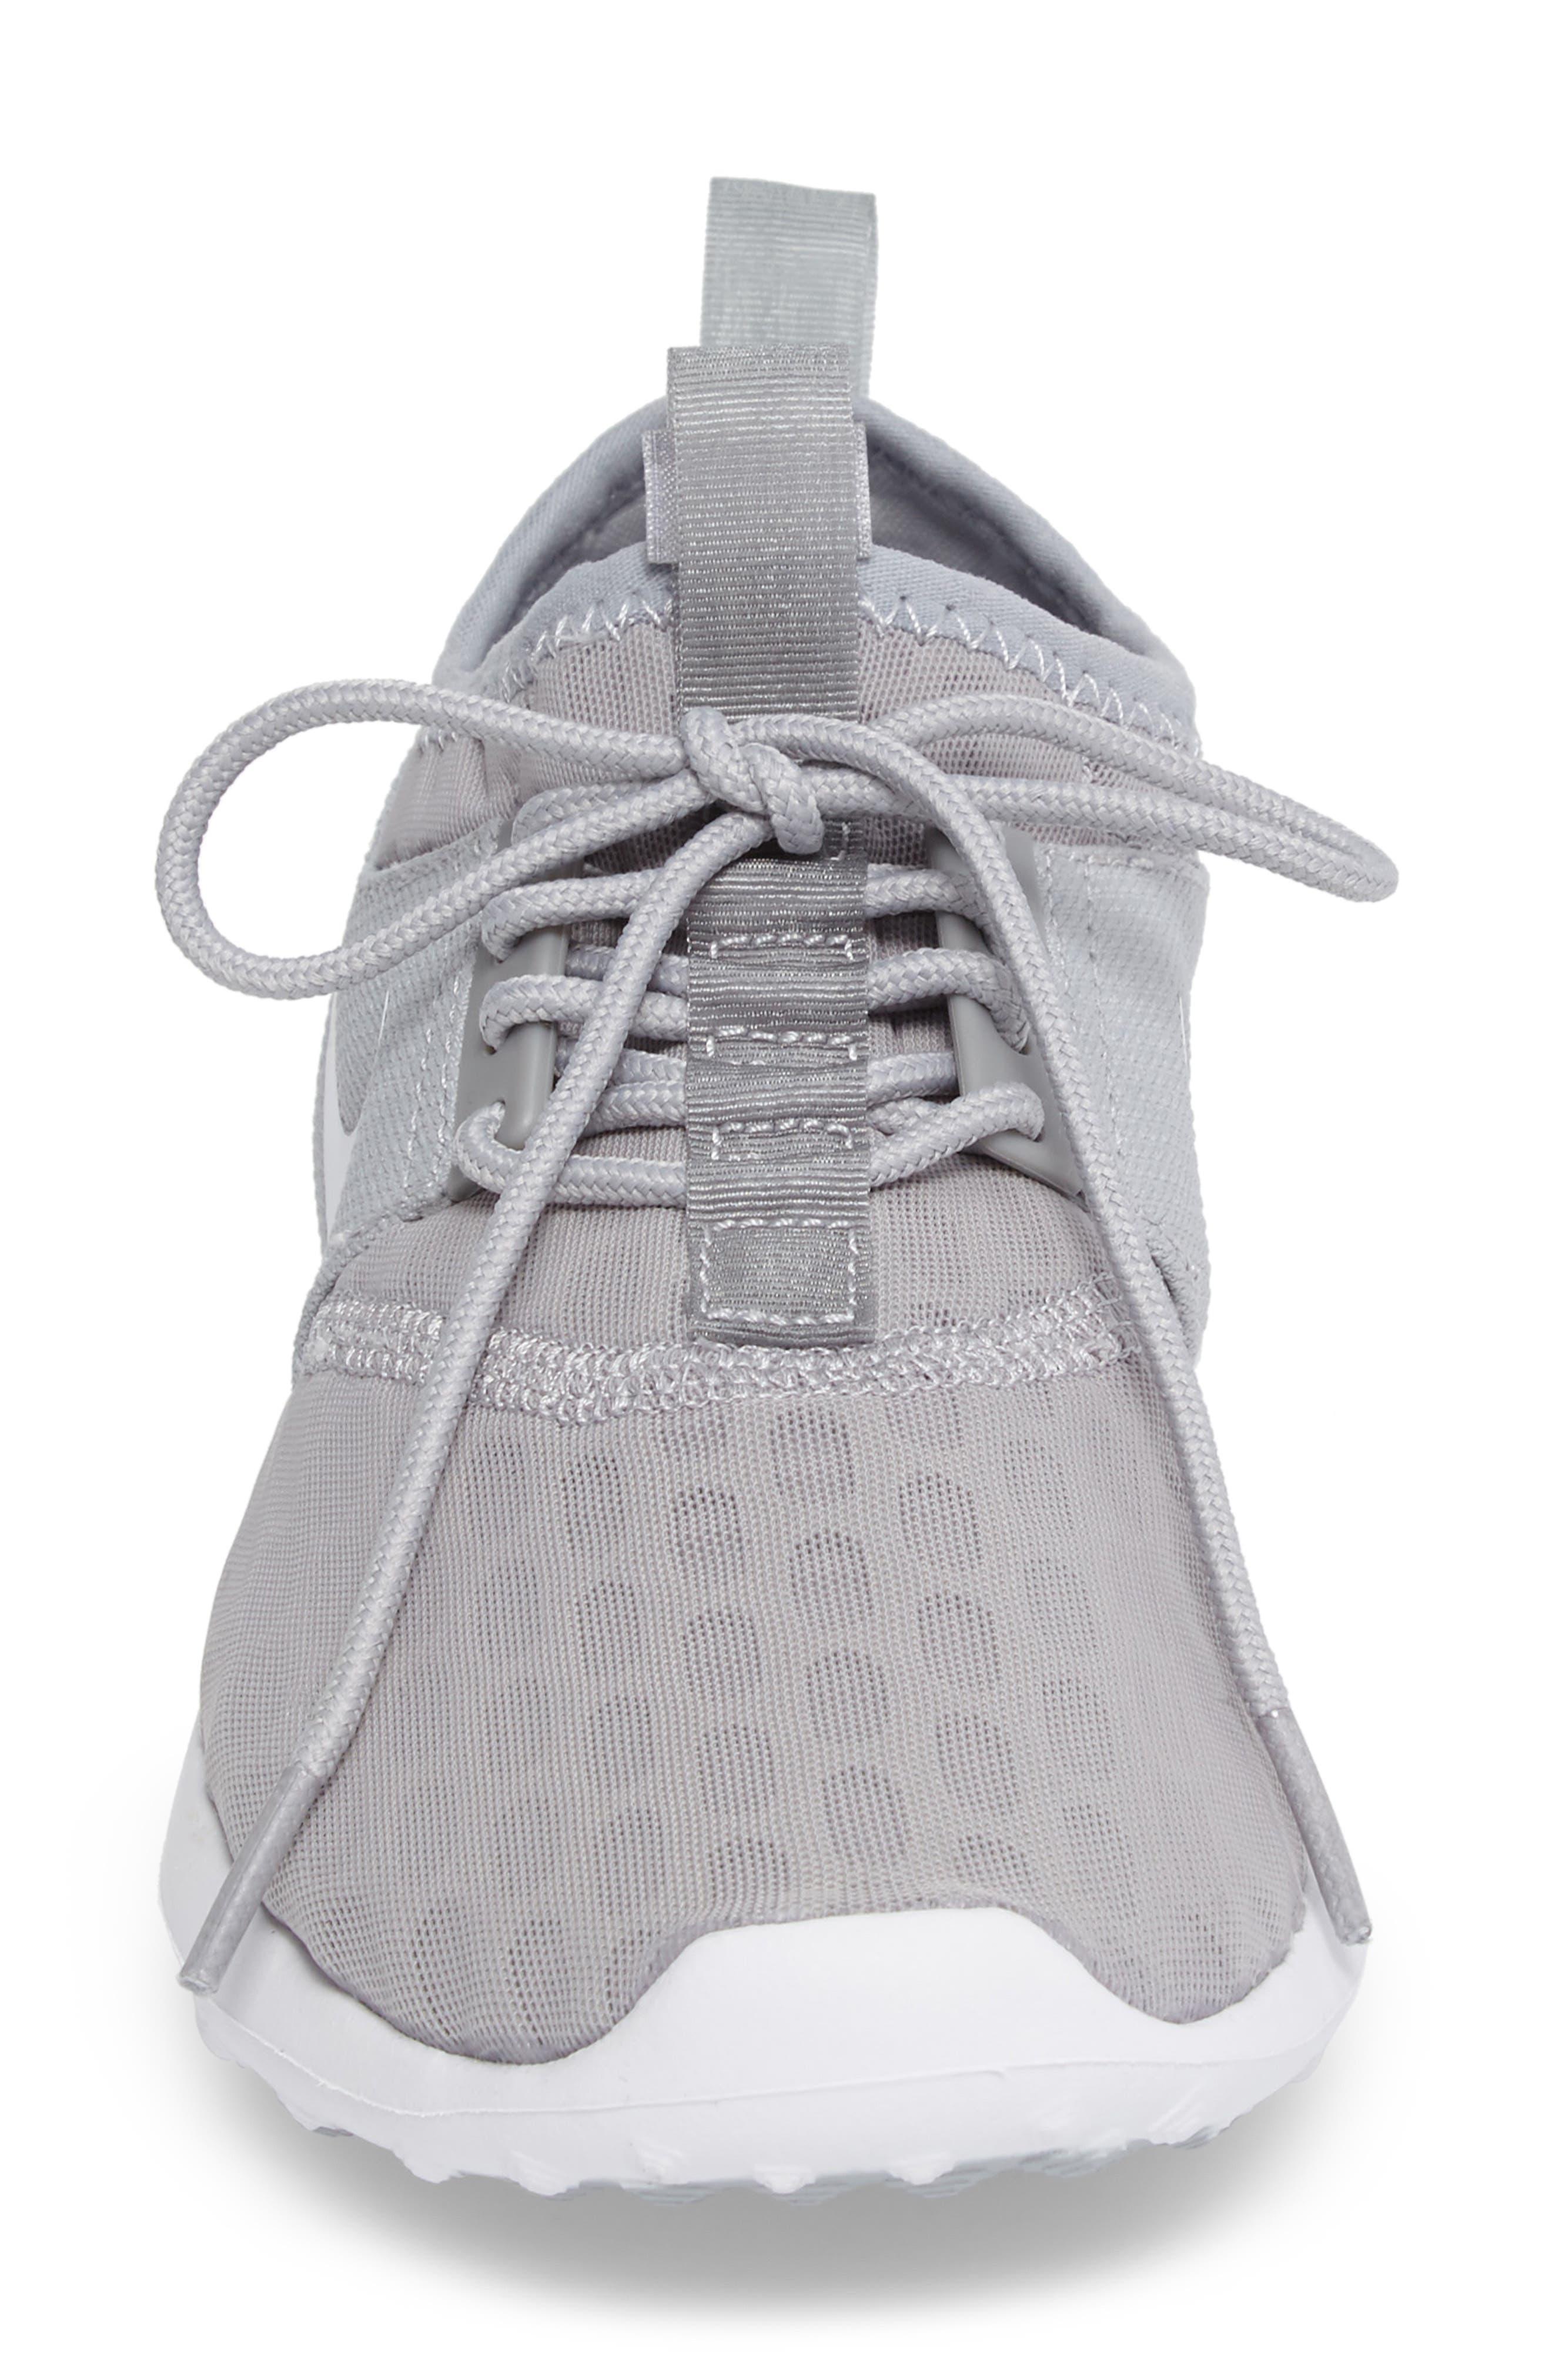 Juvenate Sneaker,                             Alternate thumbnail 171, color,